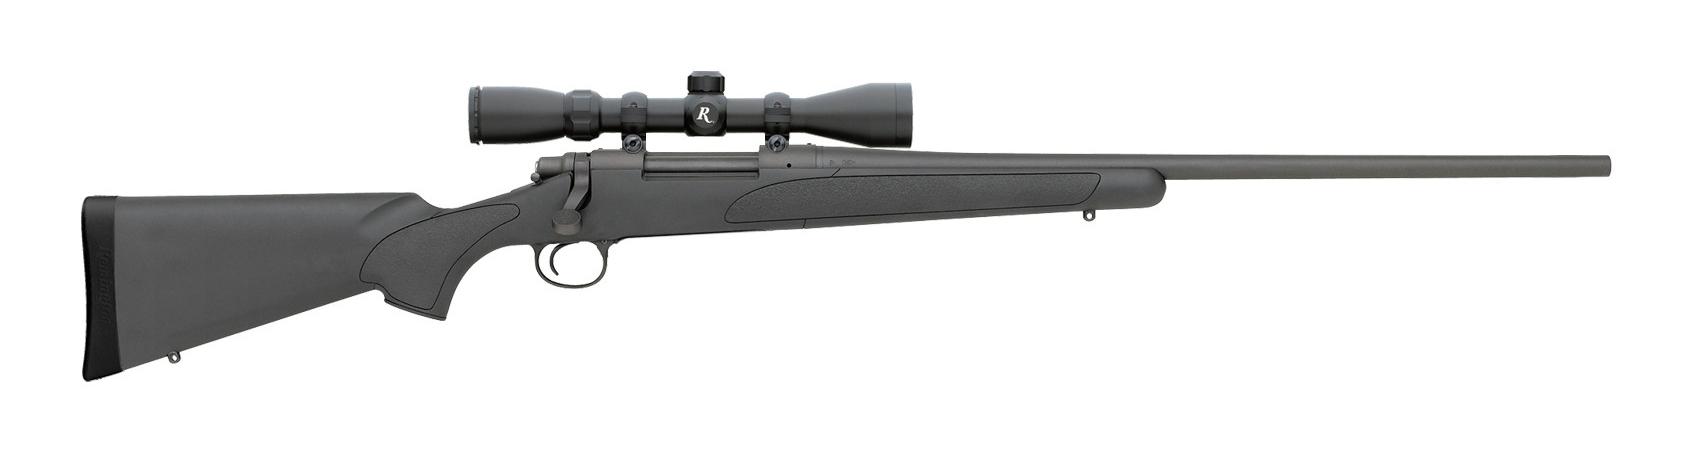 REMINGTON ARMS COMPANY, INC  MODEL 700 SERIES Models :: Gun Values